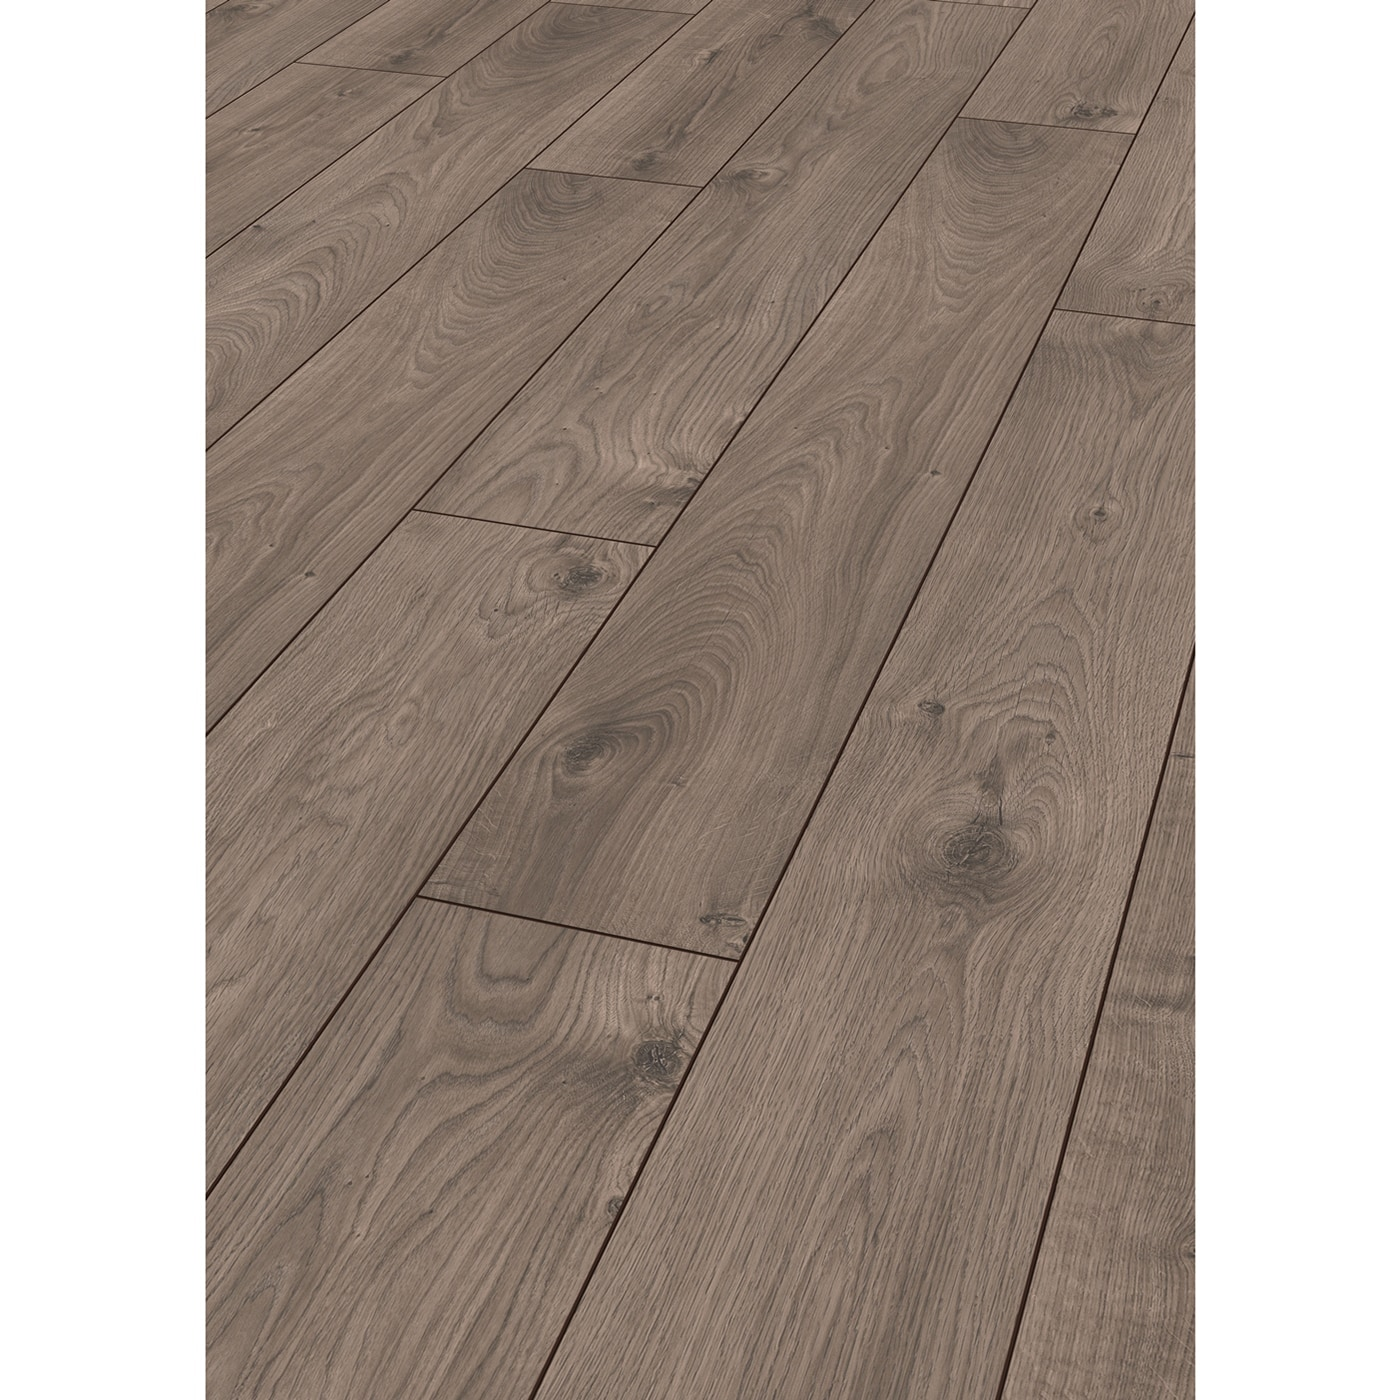 Kronotex laminate robusto 12 mm collection atlas oak for Kronotex laminate flooring reviews